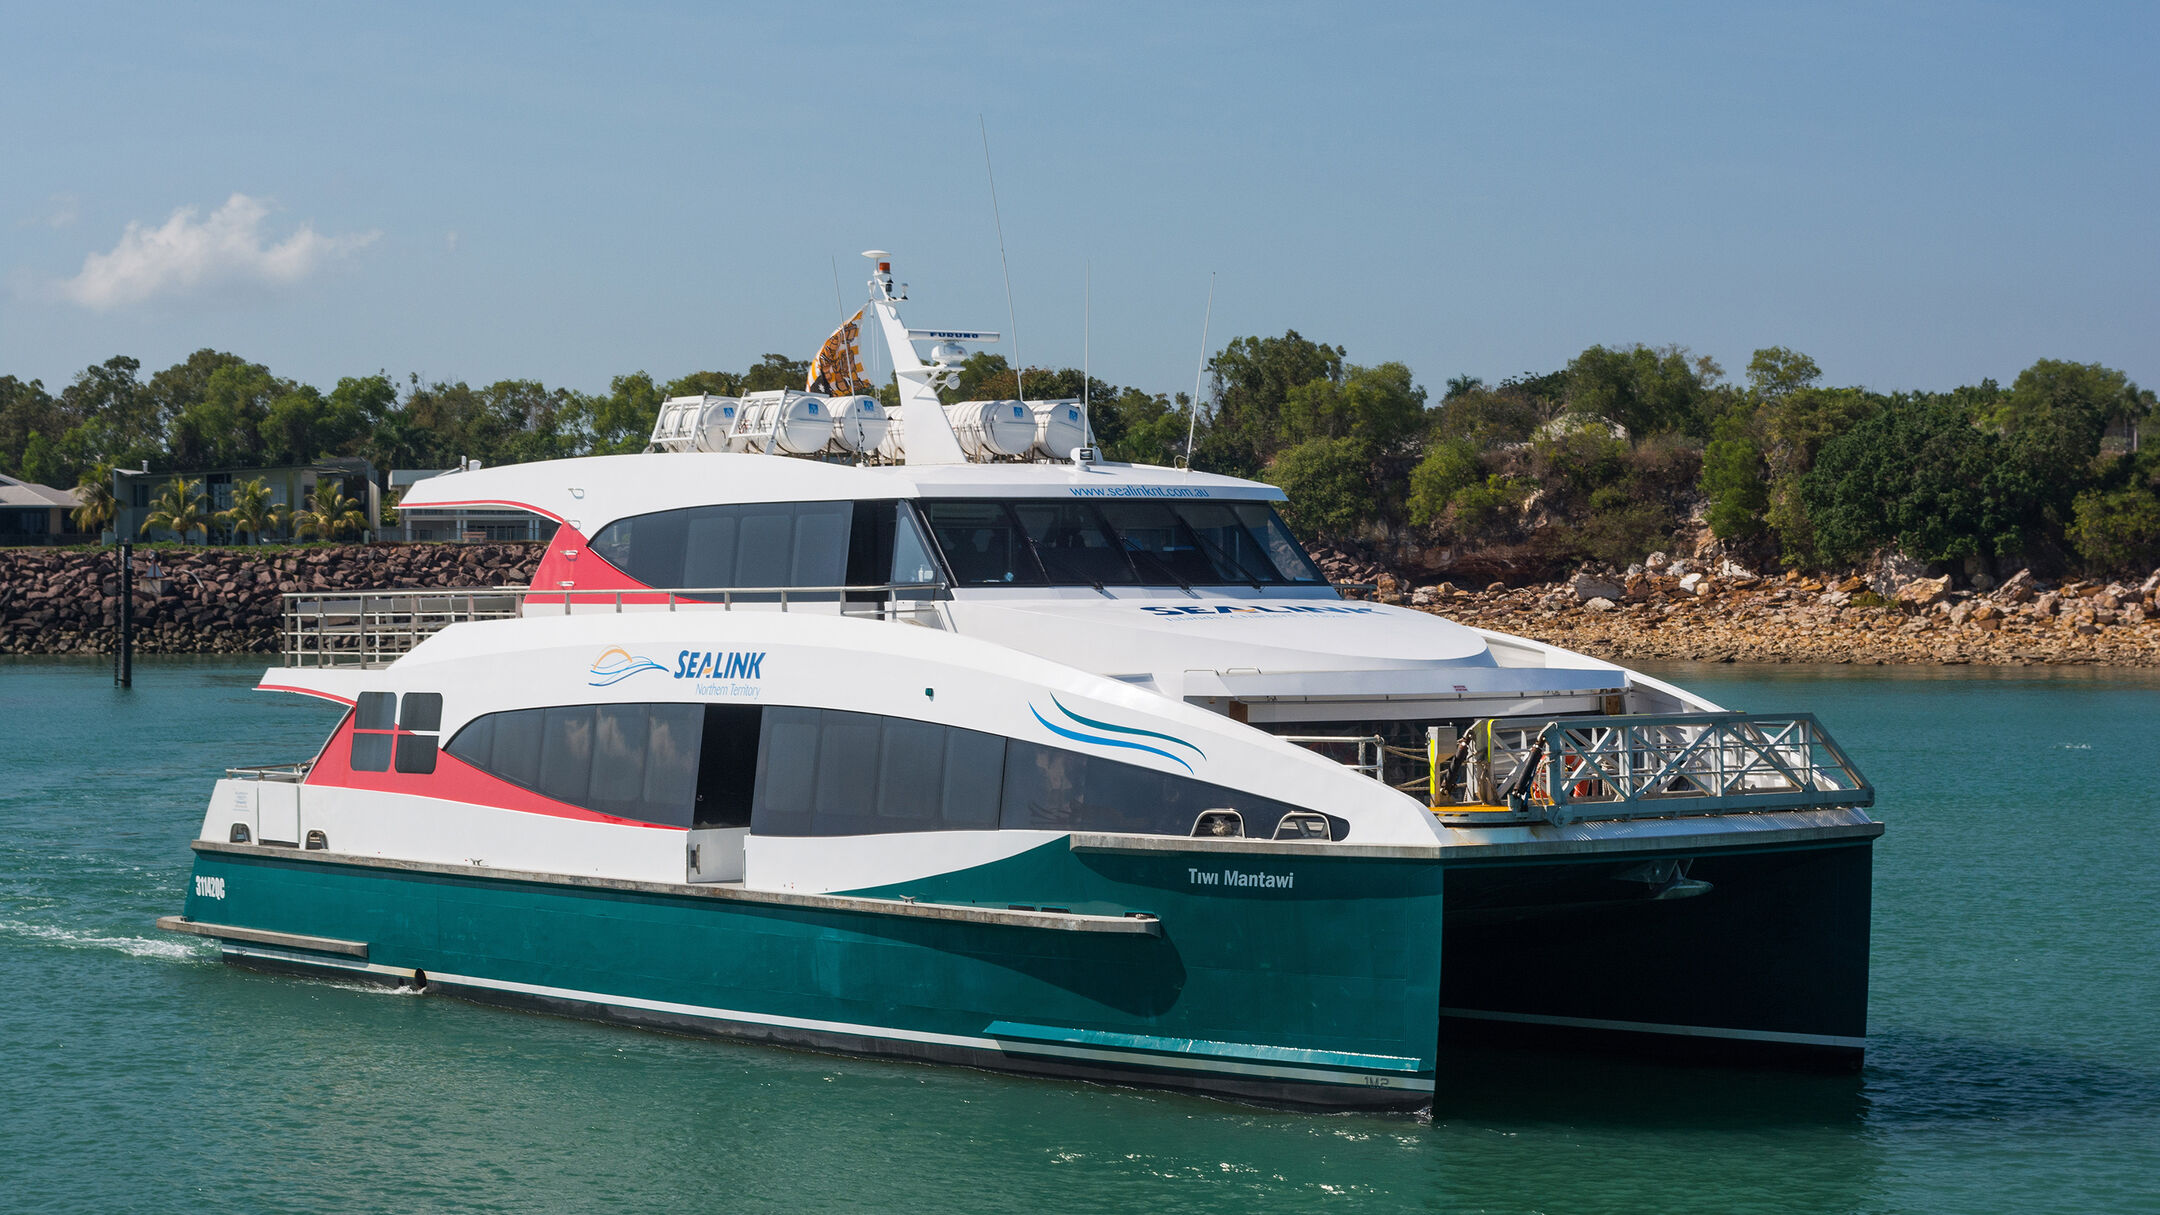 Tiwi Islands Ferry - Return Passenger Fare